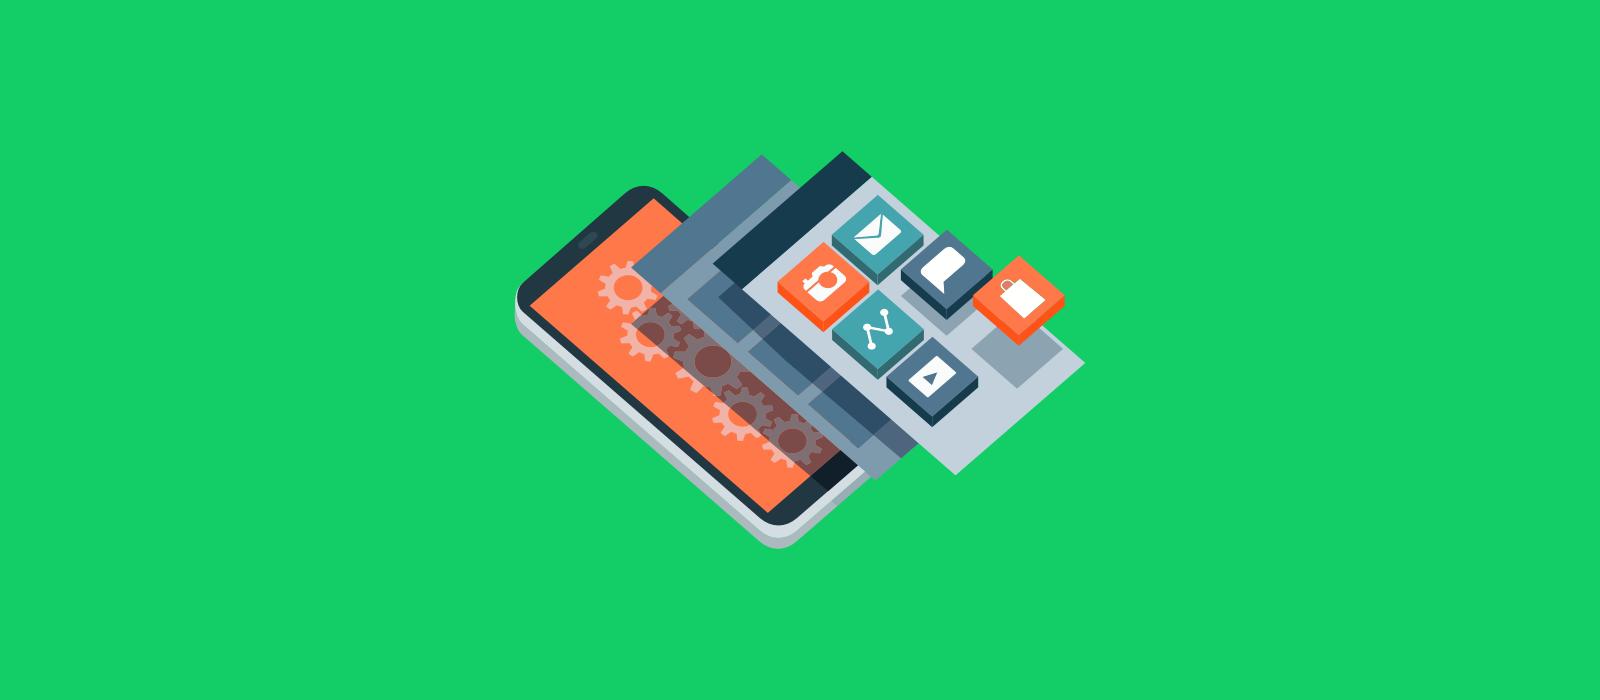 3 Creative Concepts of Mobile Tab Bar Navigation